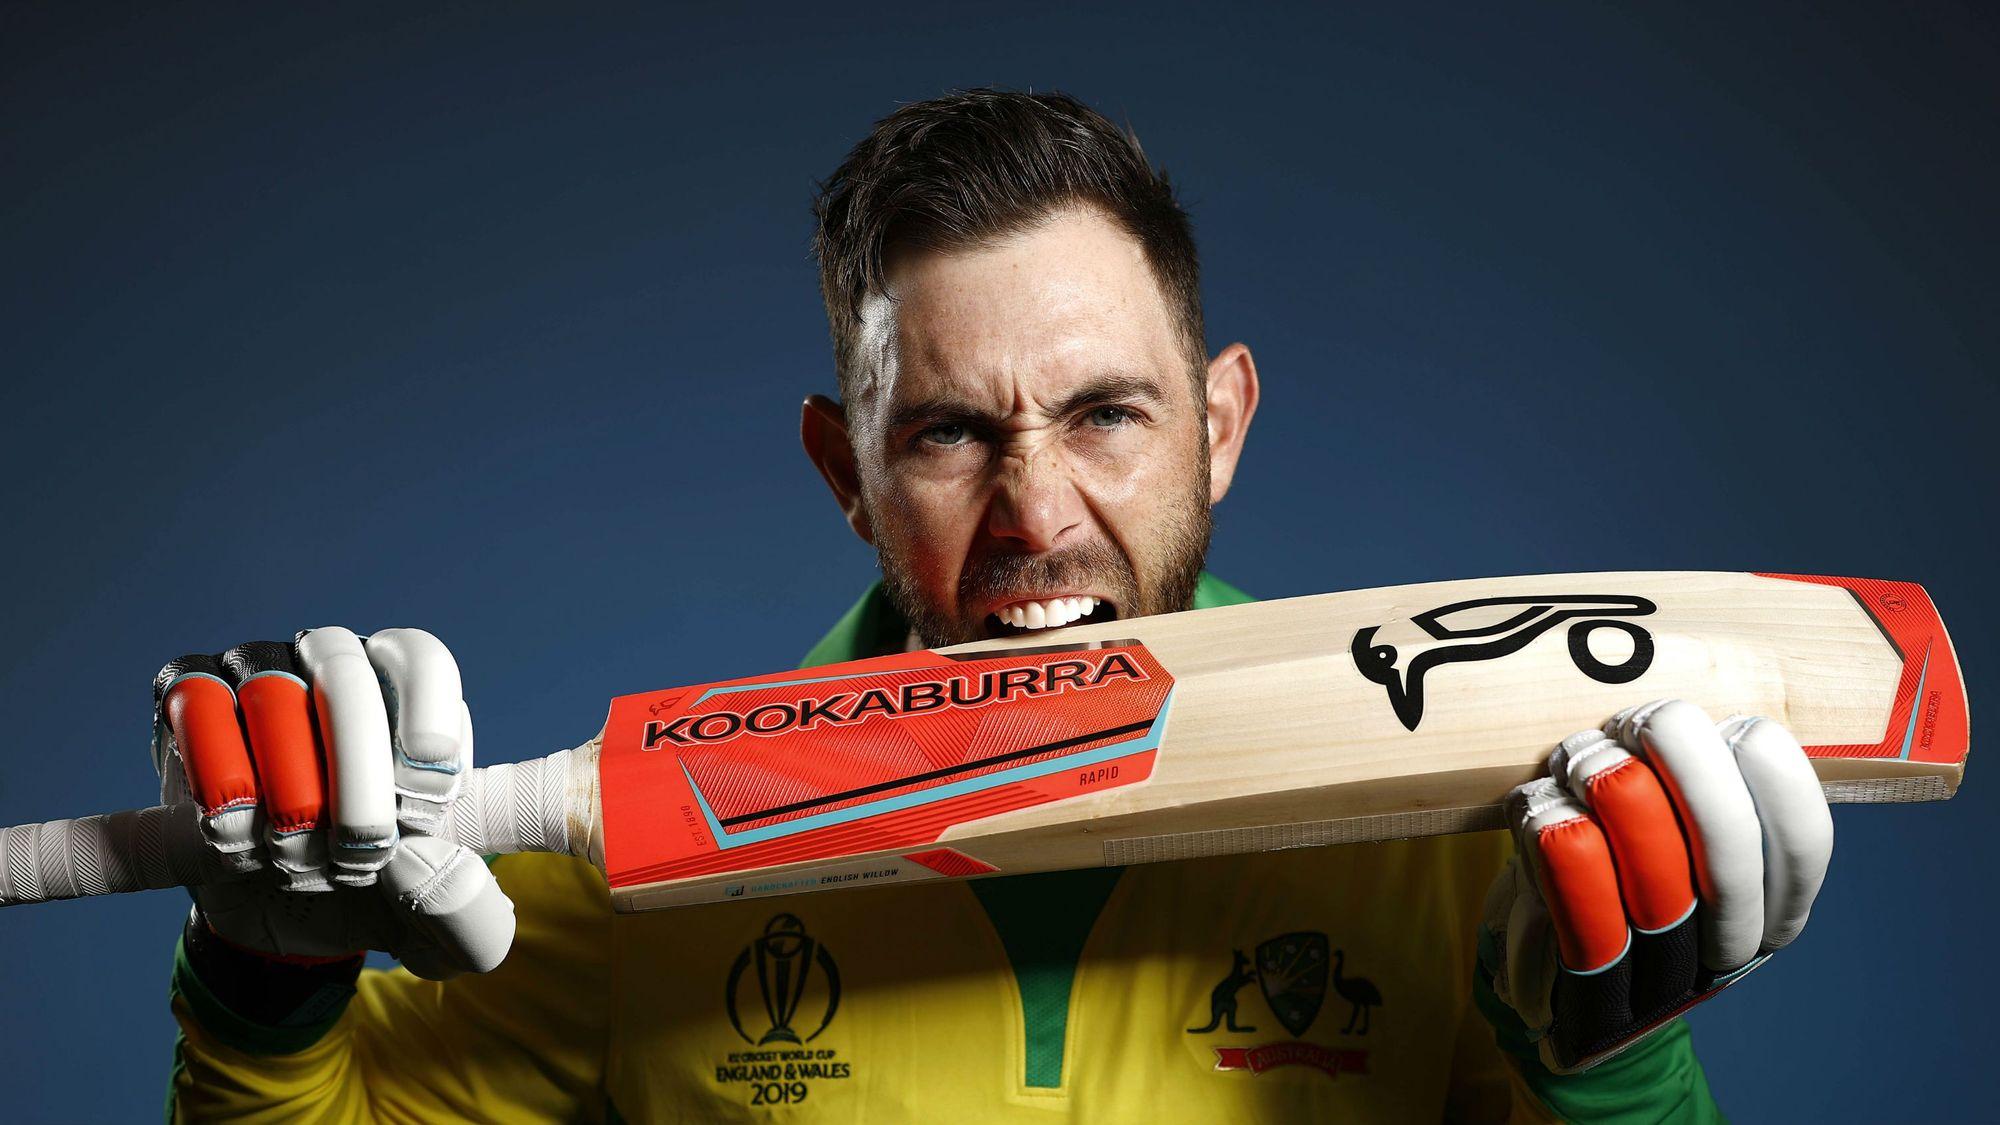 Buttler, Woakes Help England Go 3-0 Up To Take ODI Series Against Australia 1